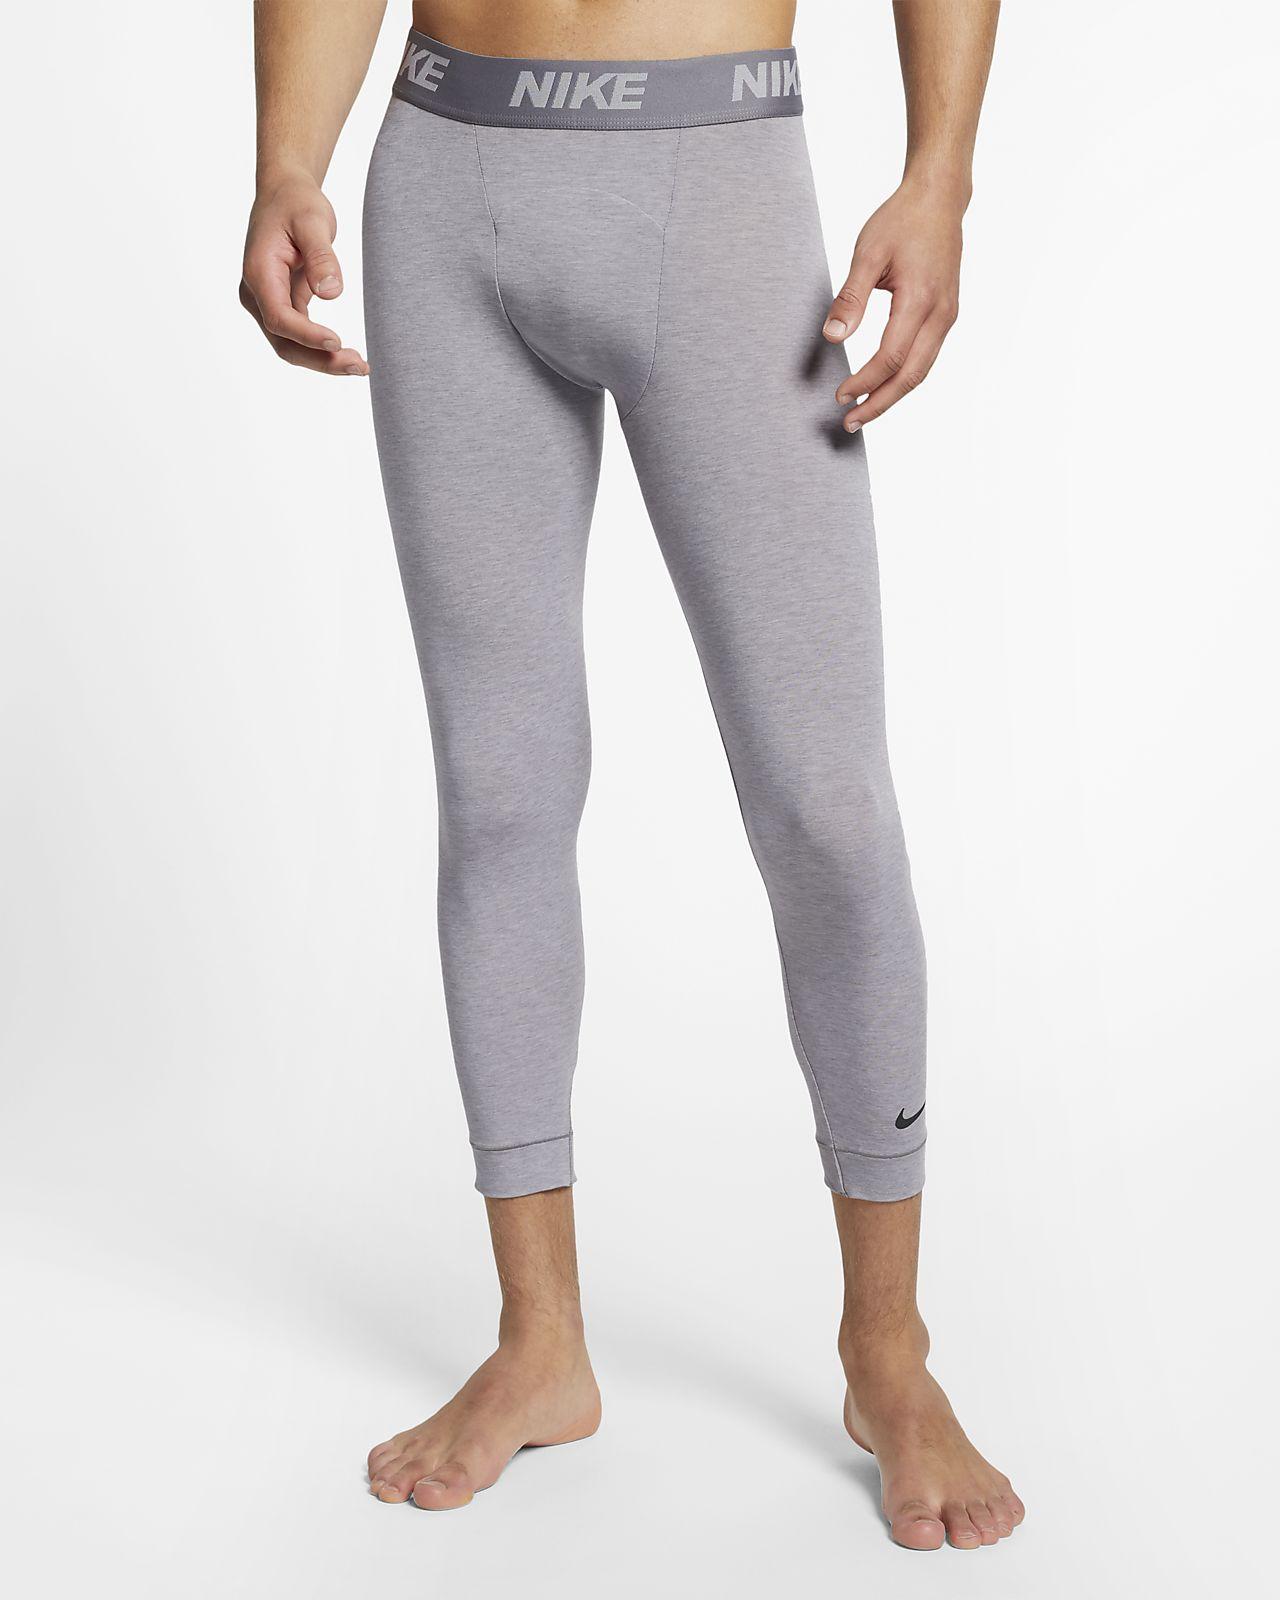 new product a363e 851ca Men s 3 4 Yoga Training Tights. Nike Dri-FIT